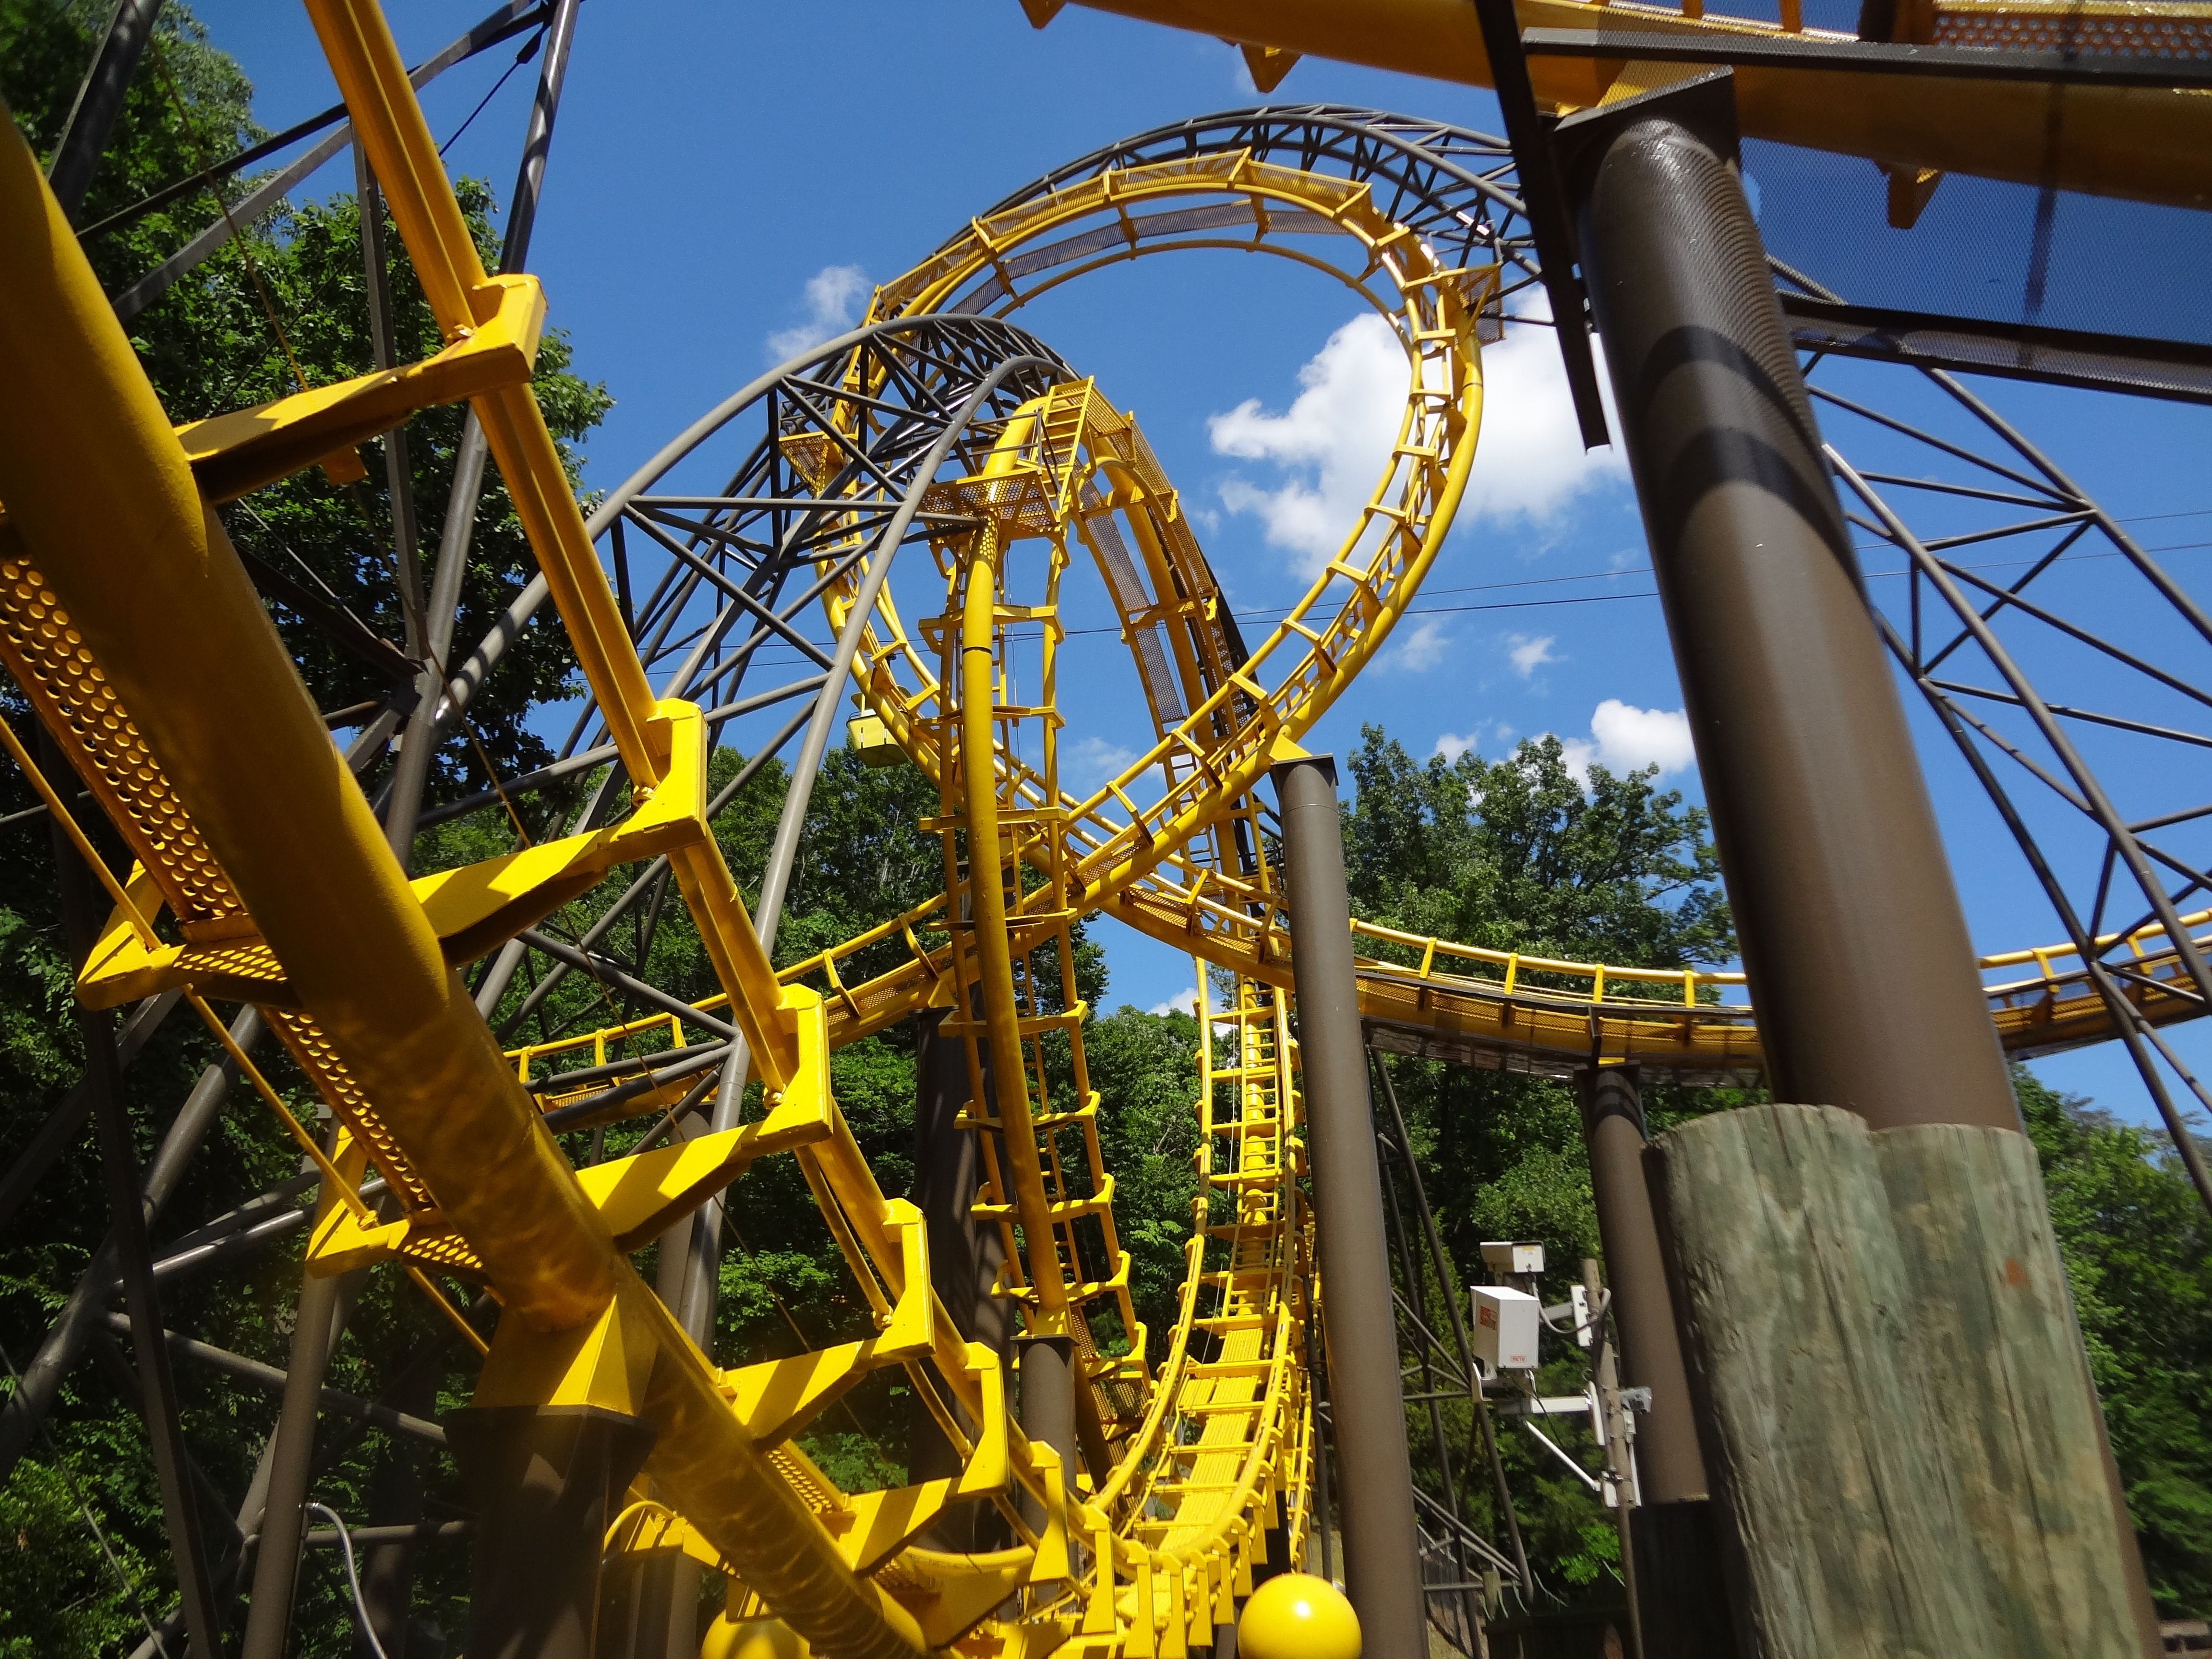 3627d88a80edcc91450e8d35b3071f65 - New Busch Gardens Williamsburg Roller Coaster